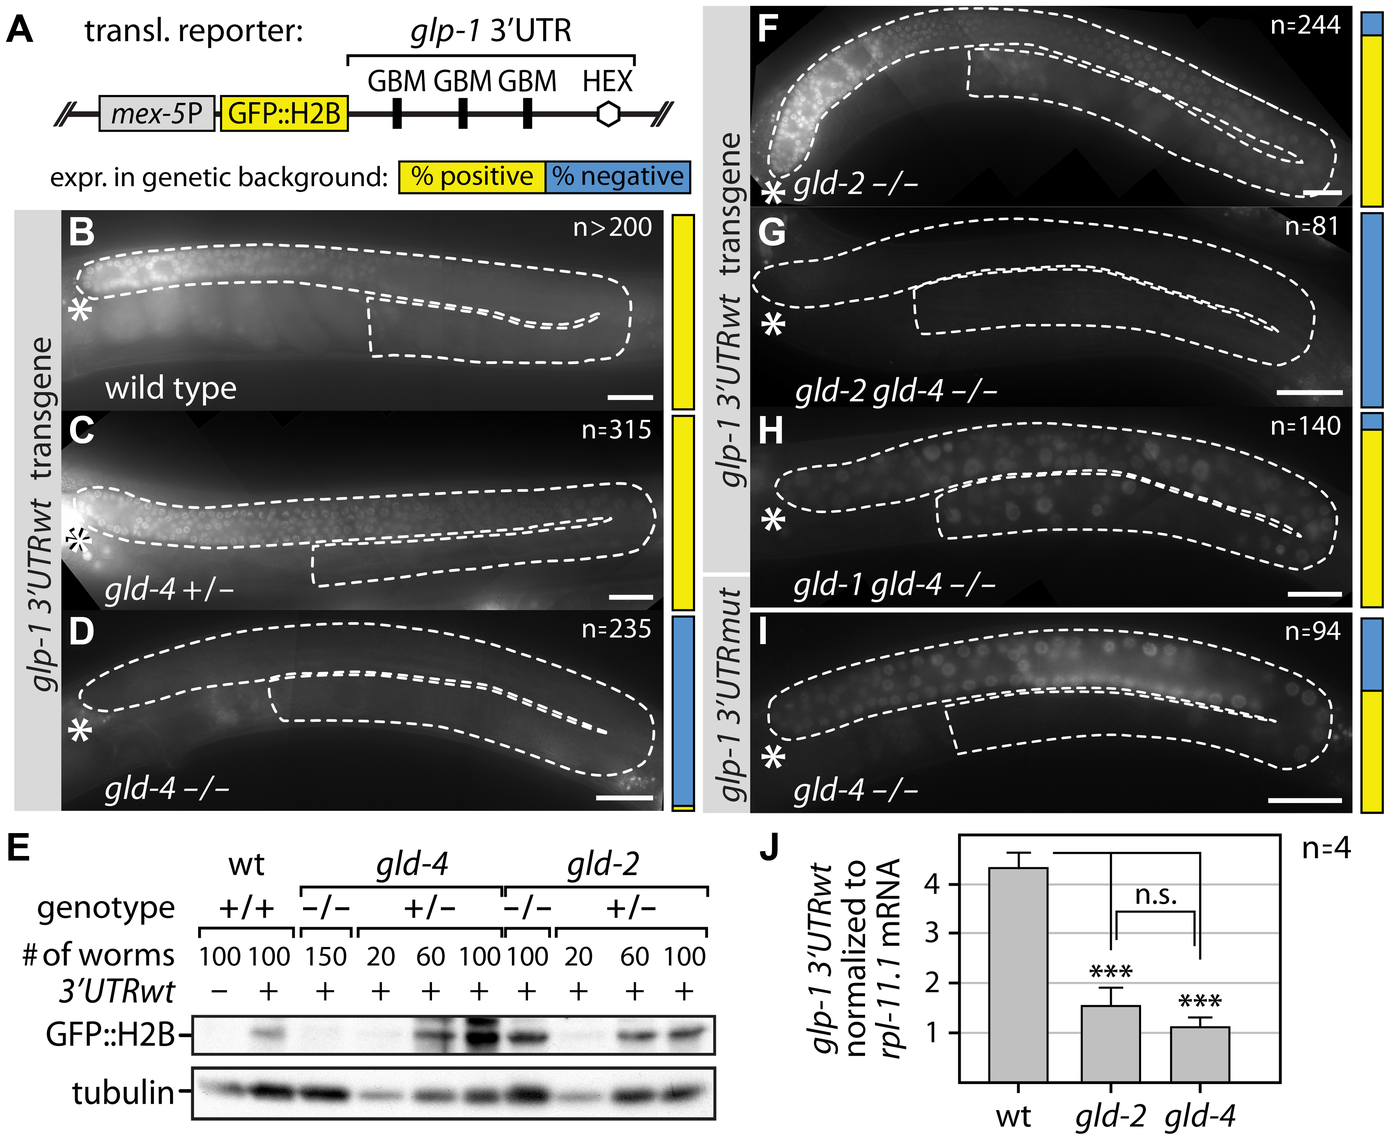 GLD-4 affects <i>glp-1</i> 3′UTR GFP reporter mRNA translation.